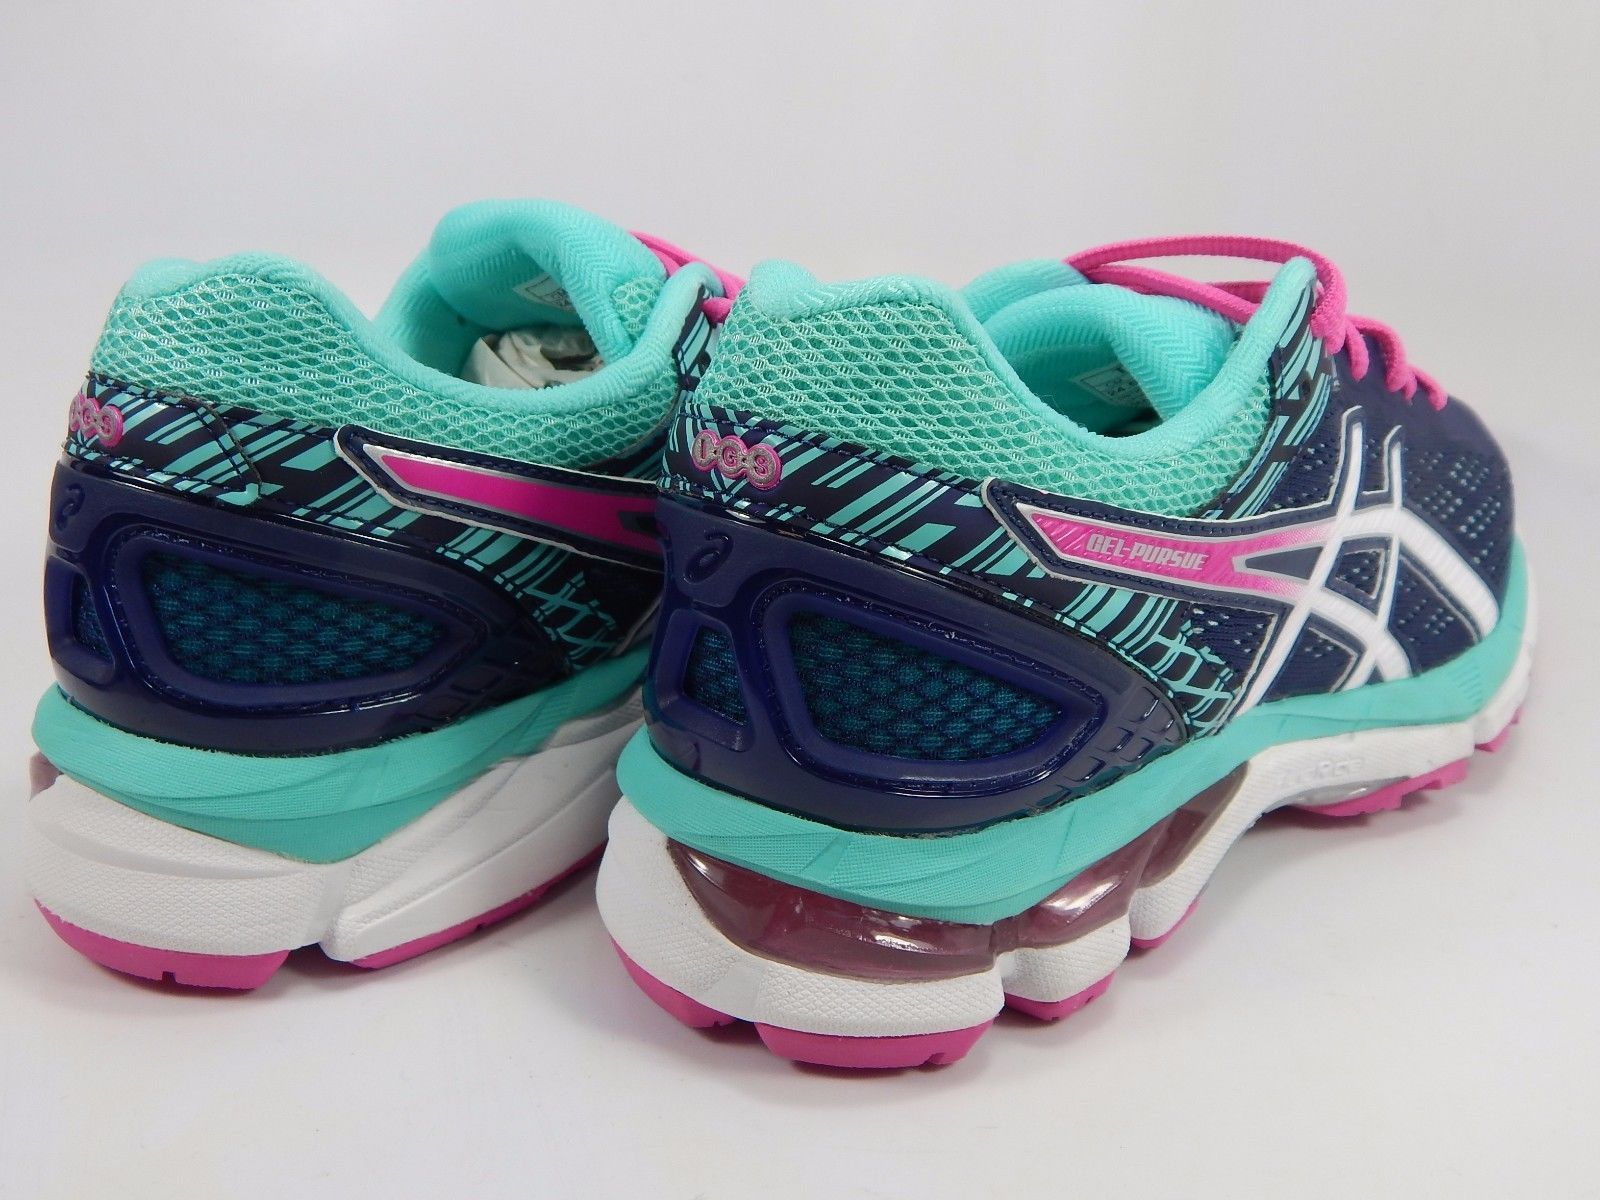 Asics Gel Pursue 3Women's Running Shoes Size US 7.5 M (B) EU 39 Blue Pink  T6C5N